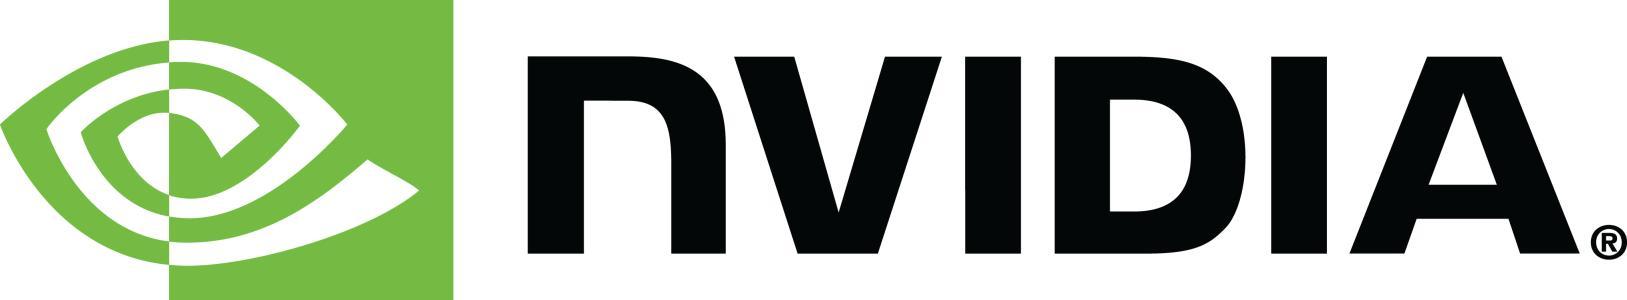 Consumer Walk列出了早期的NVIDIA MSI和GeForce GTX显卡和GPU促销